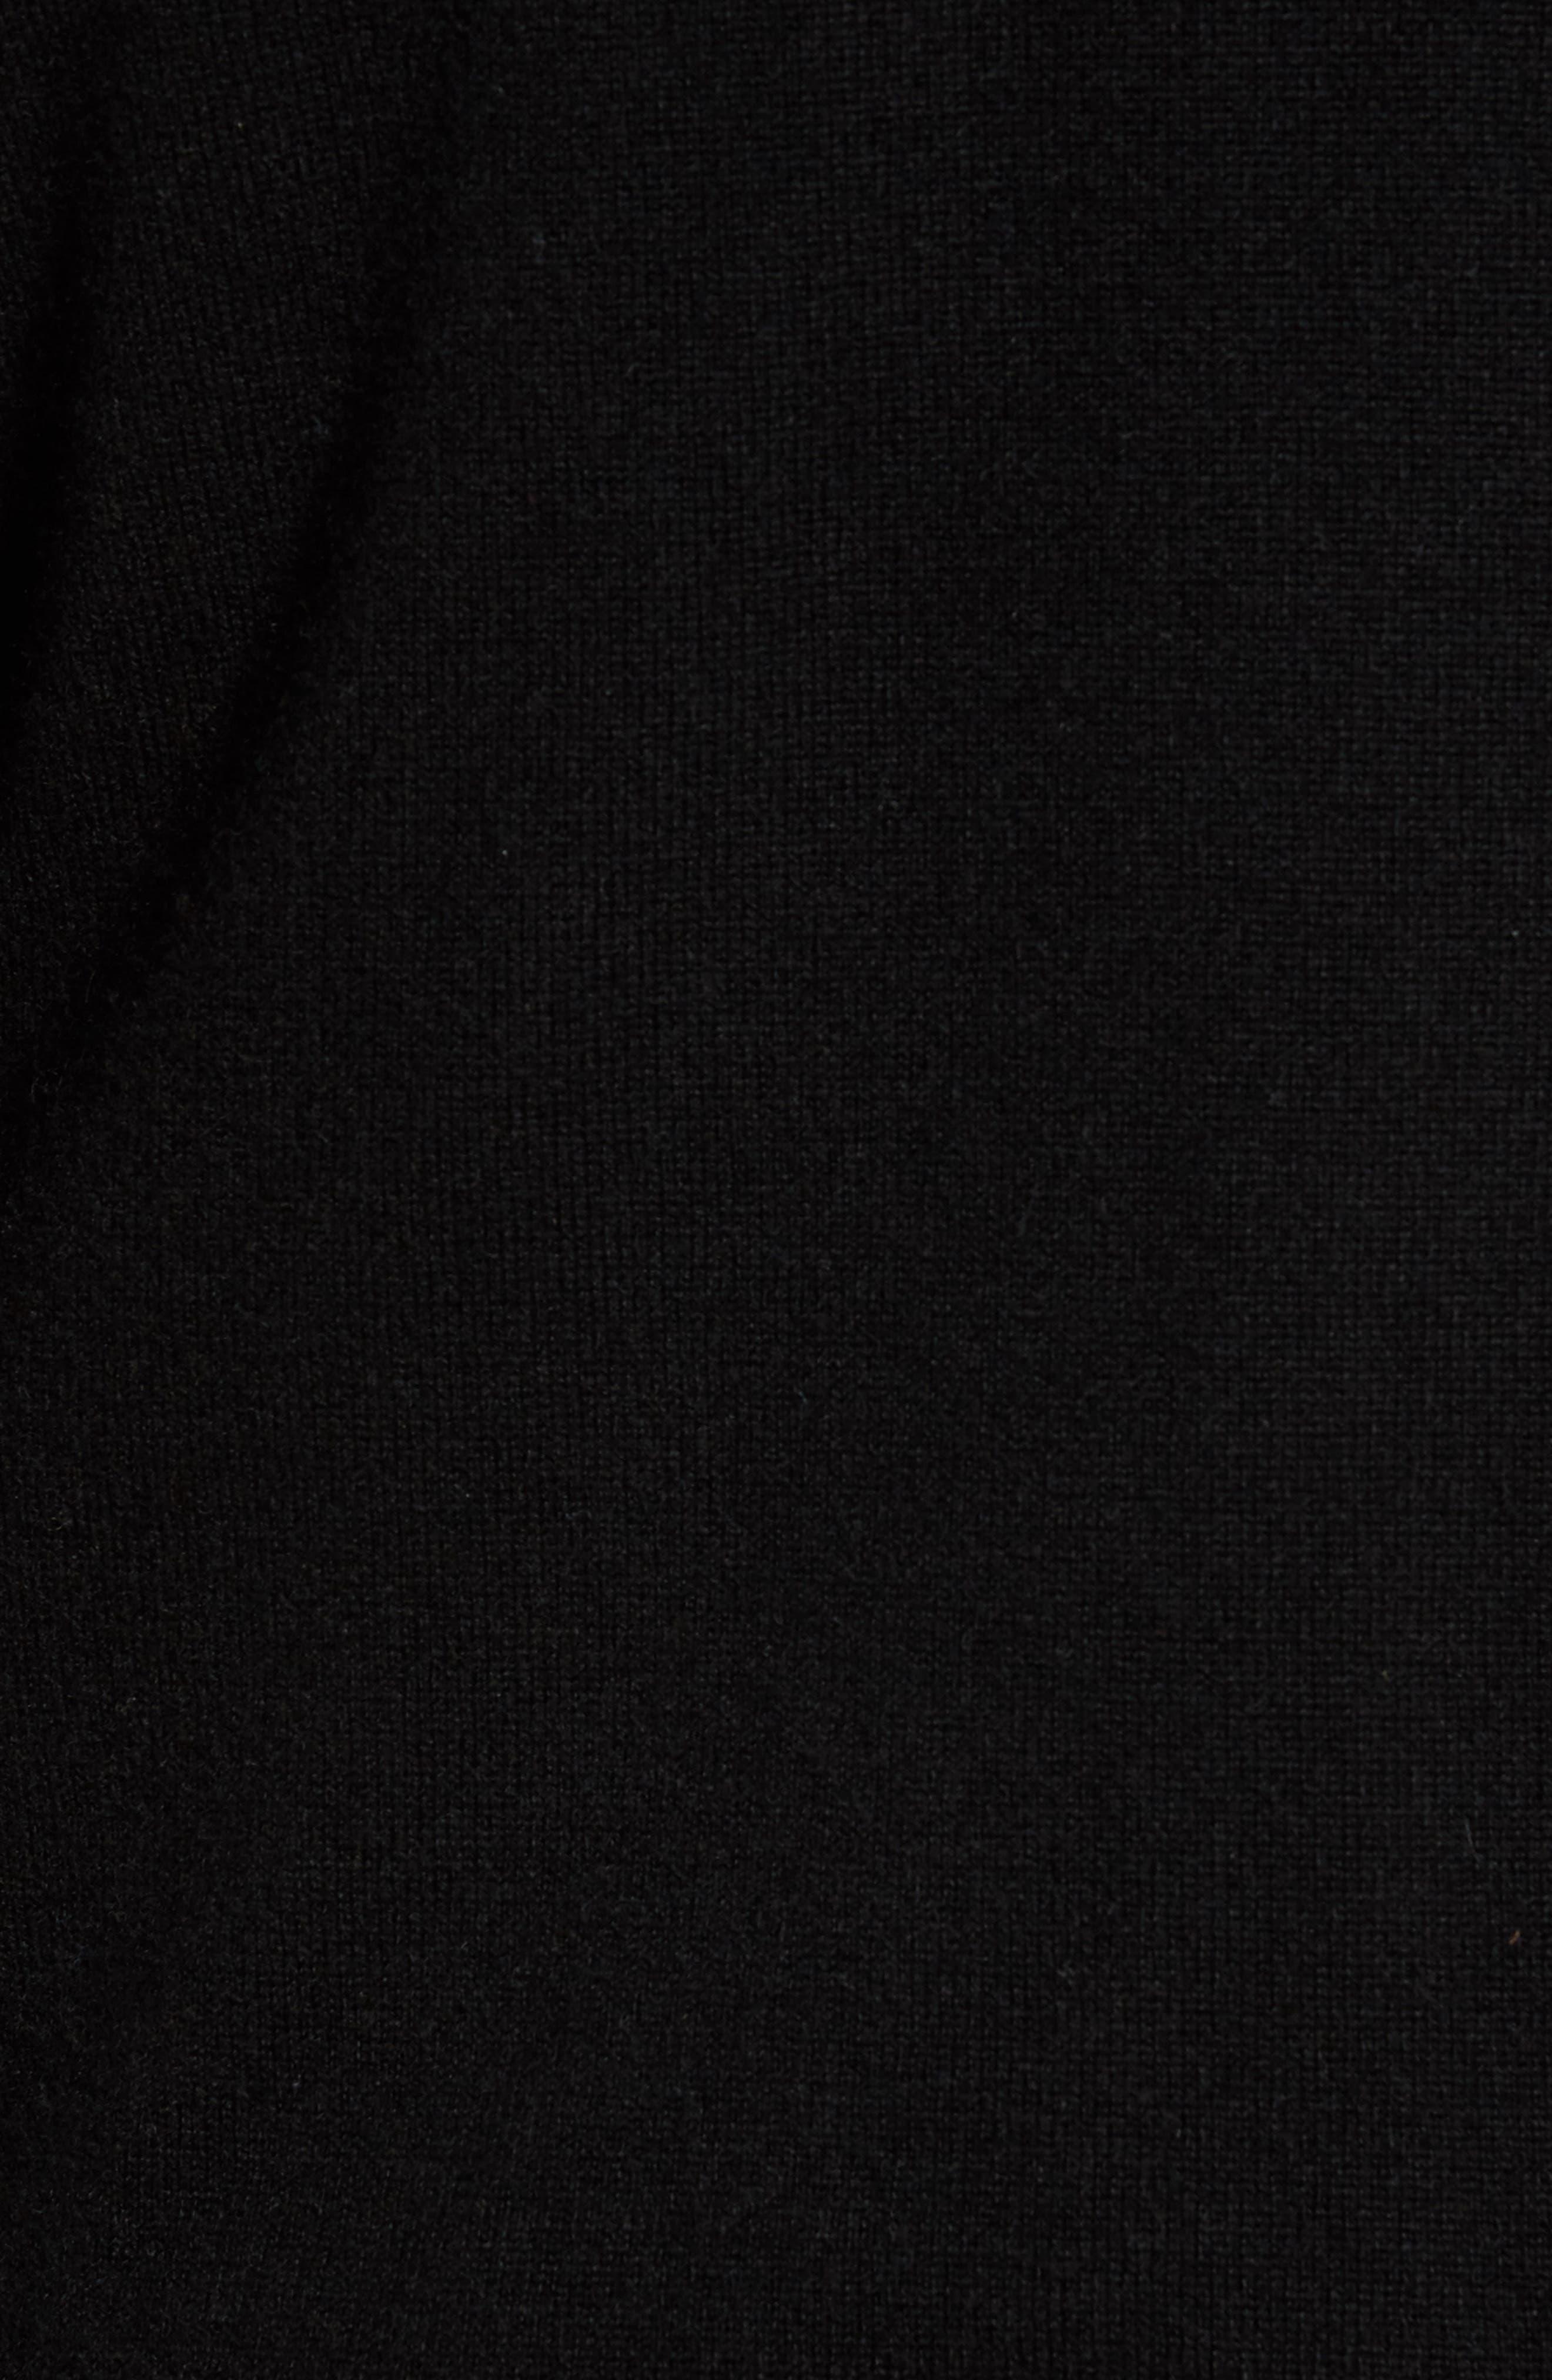 V-Neck Cashmere Sweater,                             Alternate thumbnail 5, color,                             001